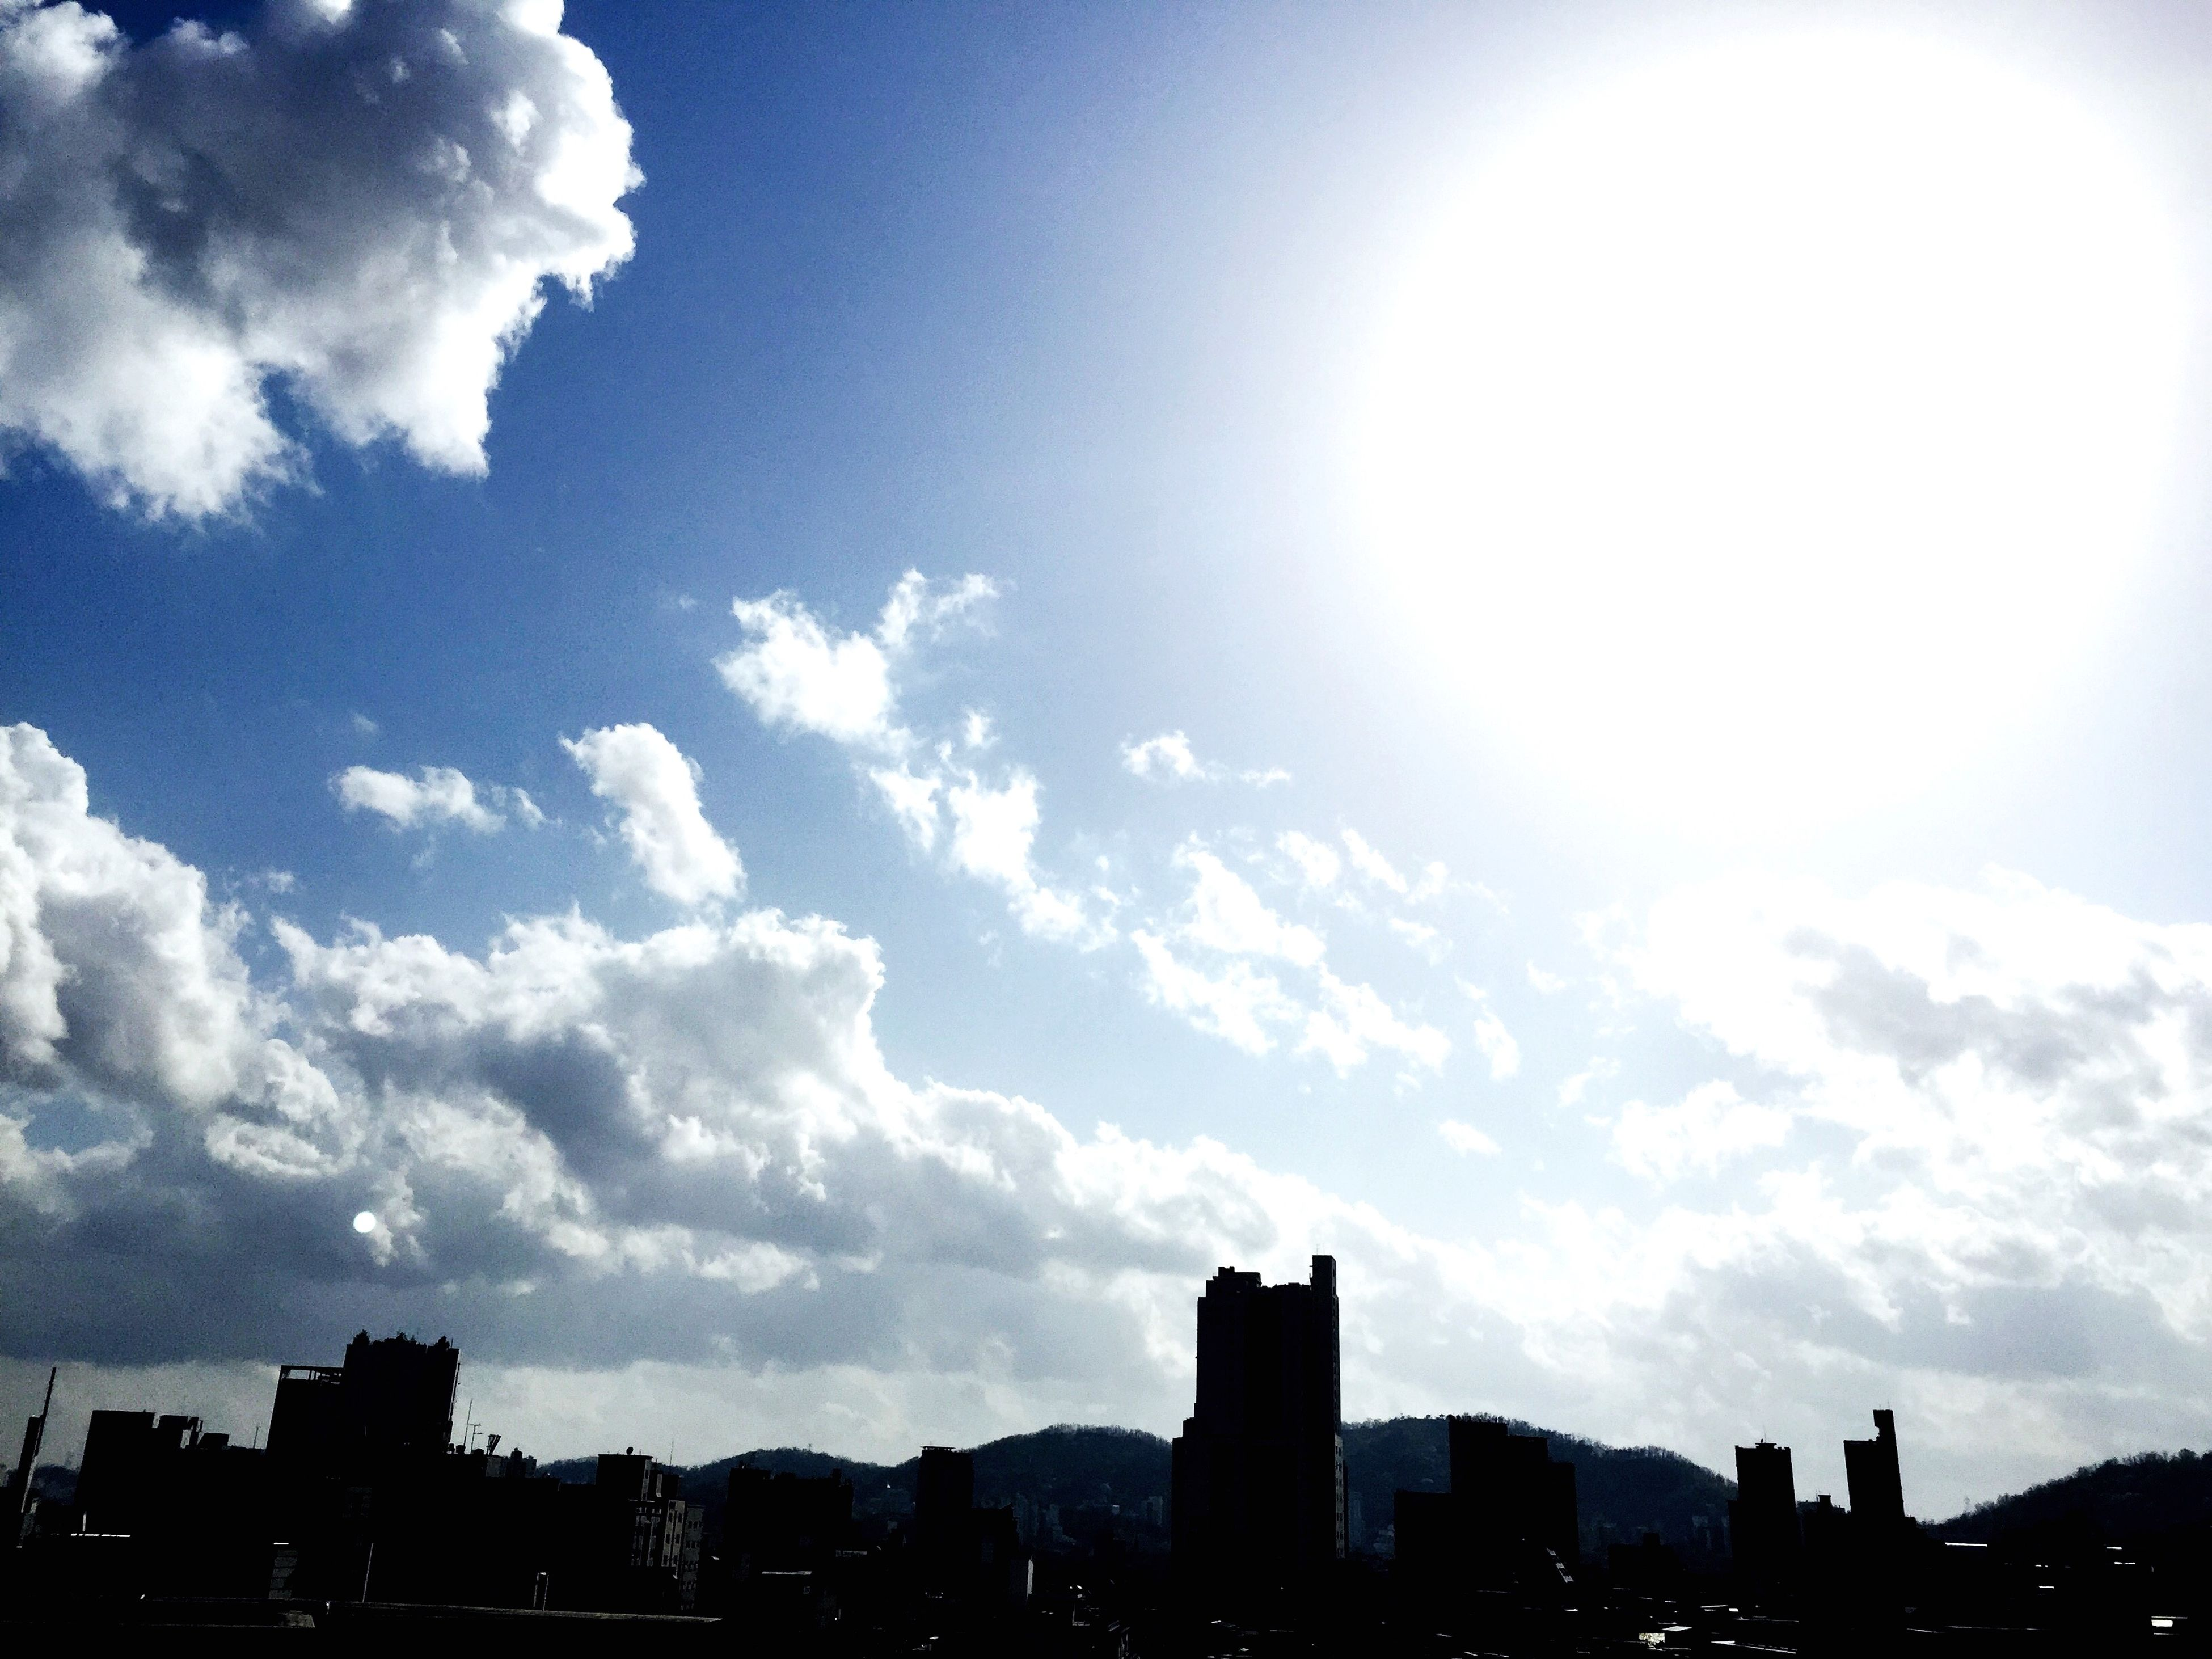 building exterior, architecture, built structure, city, sky, silhouette, skyscraper, sun, cityscape, sunbeam, sunlight, cloud - sky, low angle view, urban skyline, cloud, building, outdoors, skyline, tall - high, office building